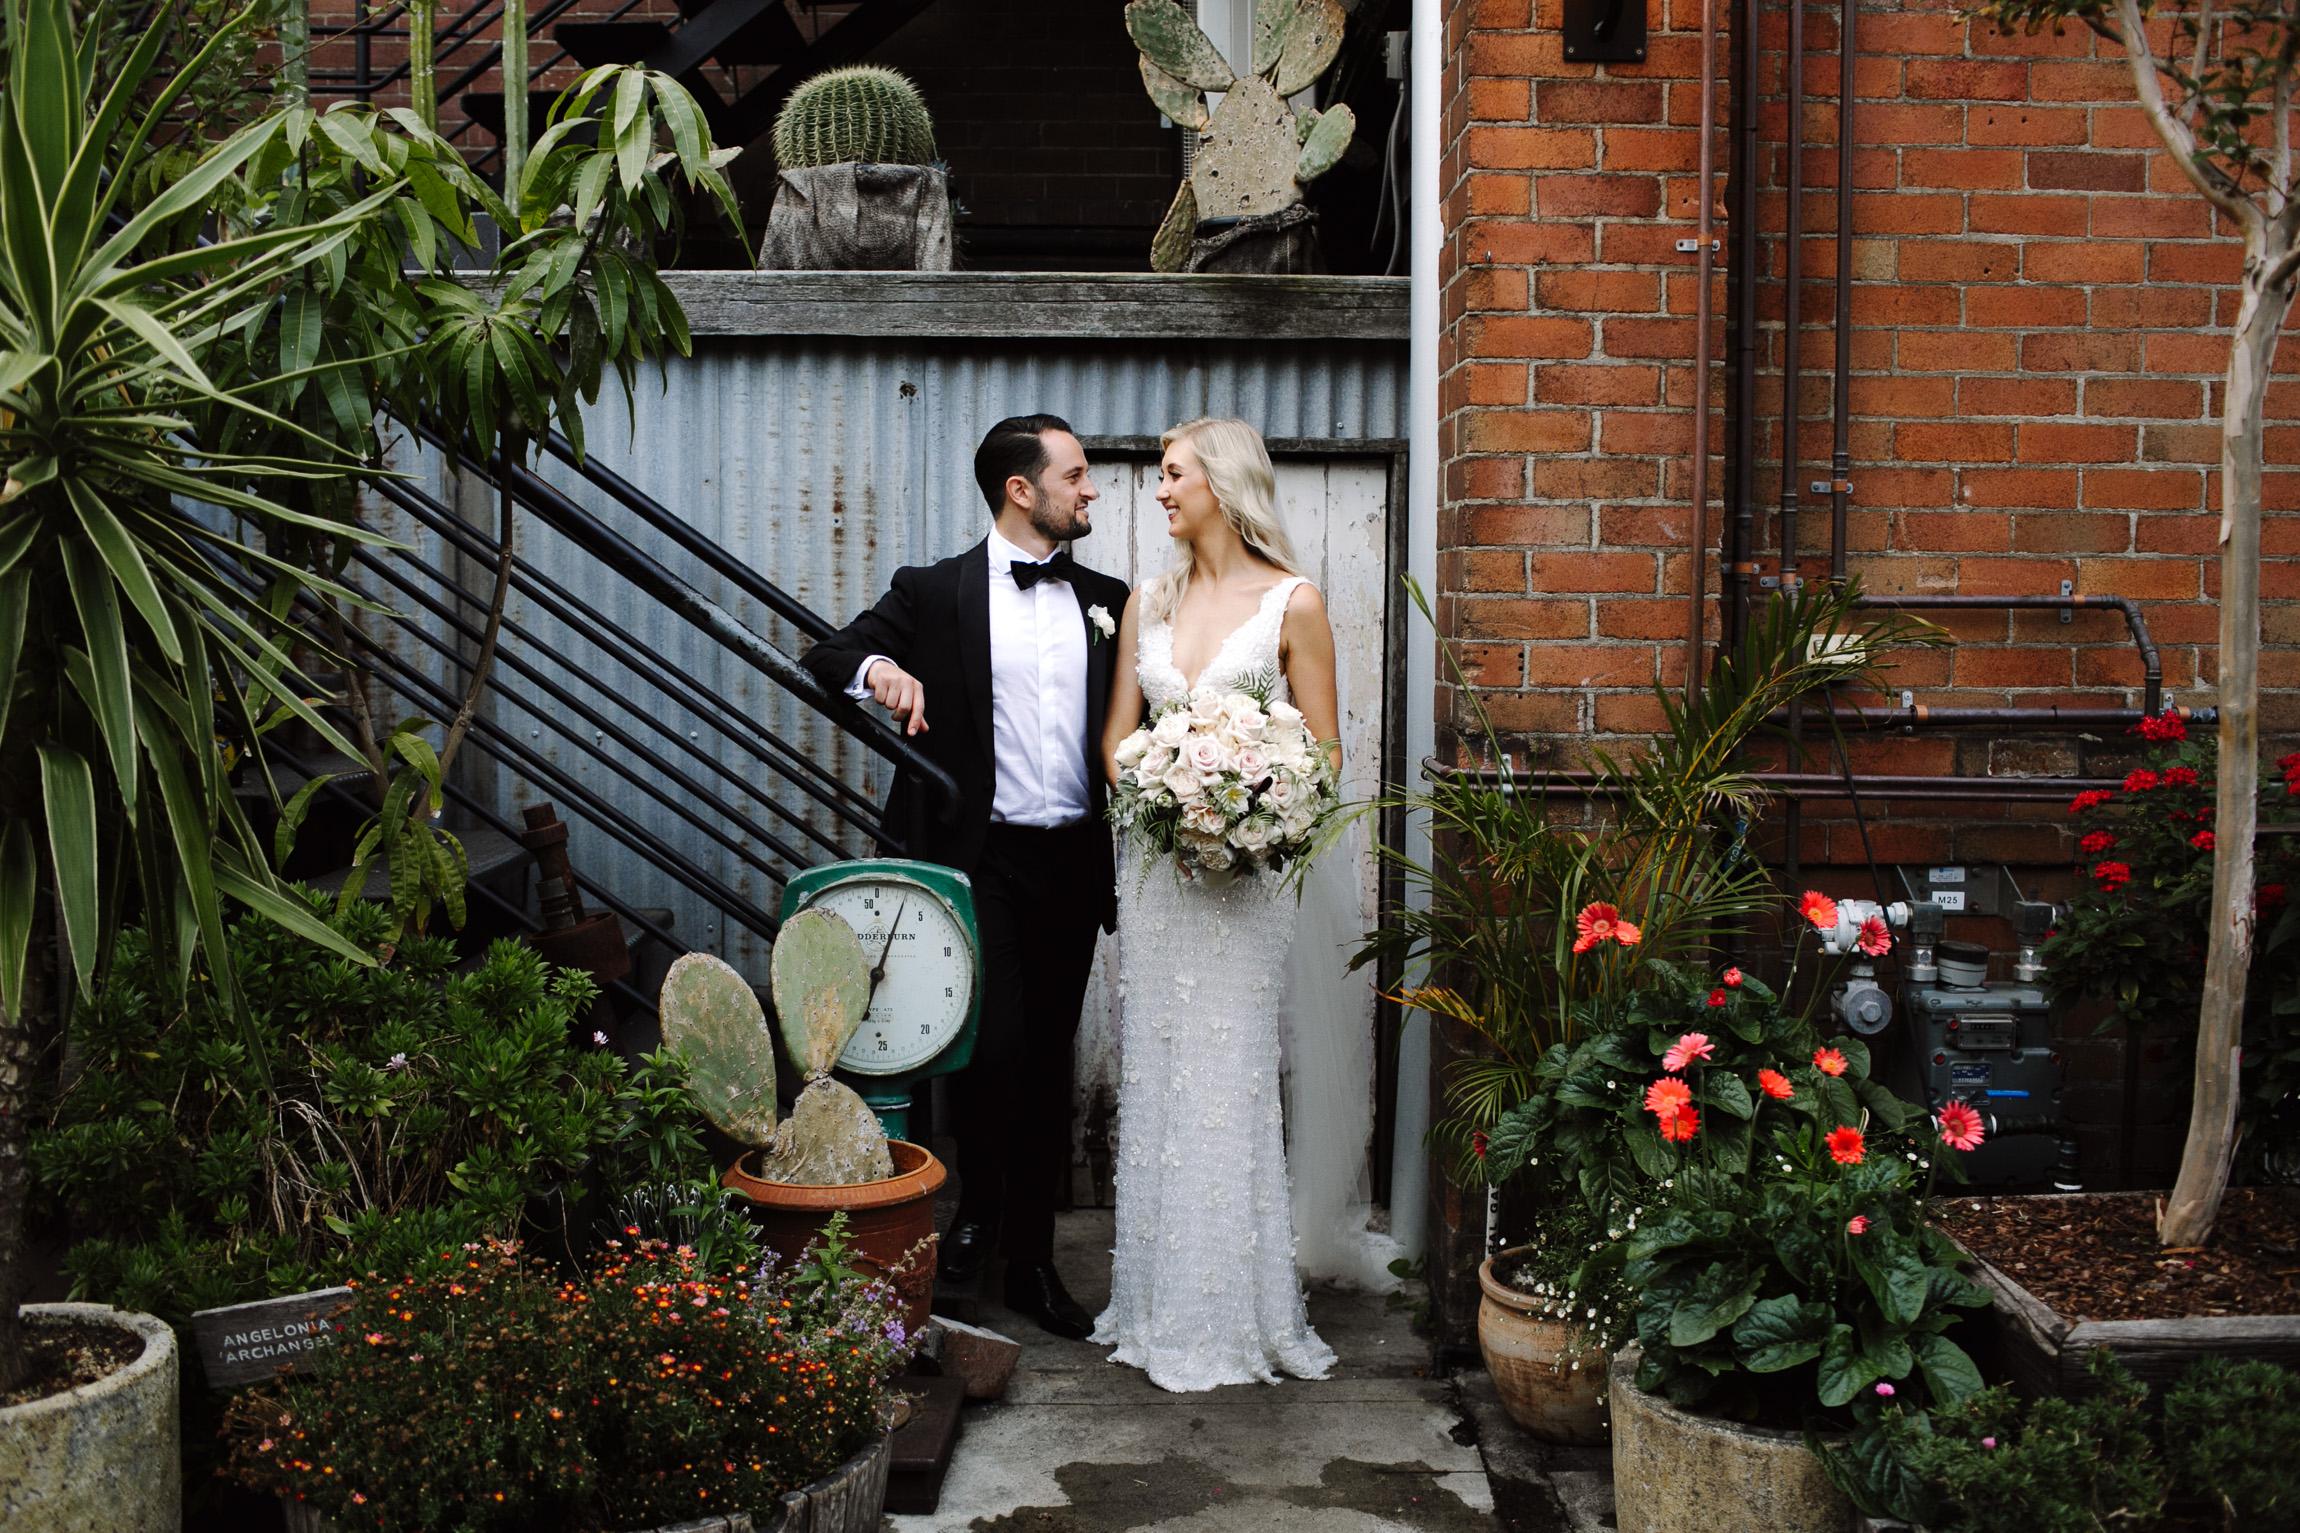 180223_justinaaron_wedding_charlotte_david_h-161.jpg